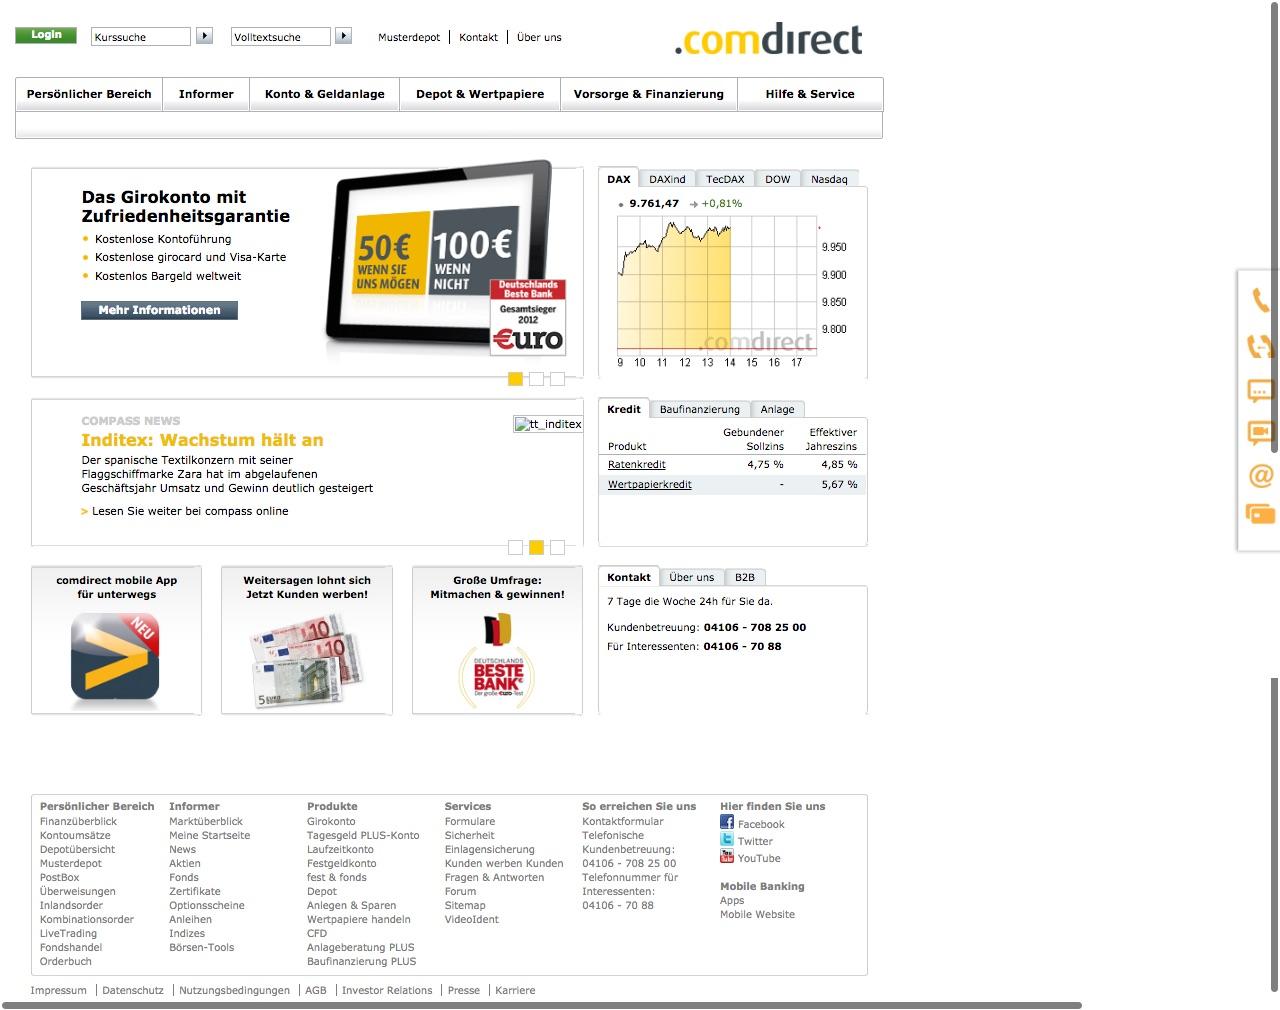 comdirect Bank Konto Online Banking alt